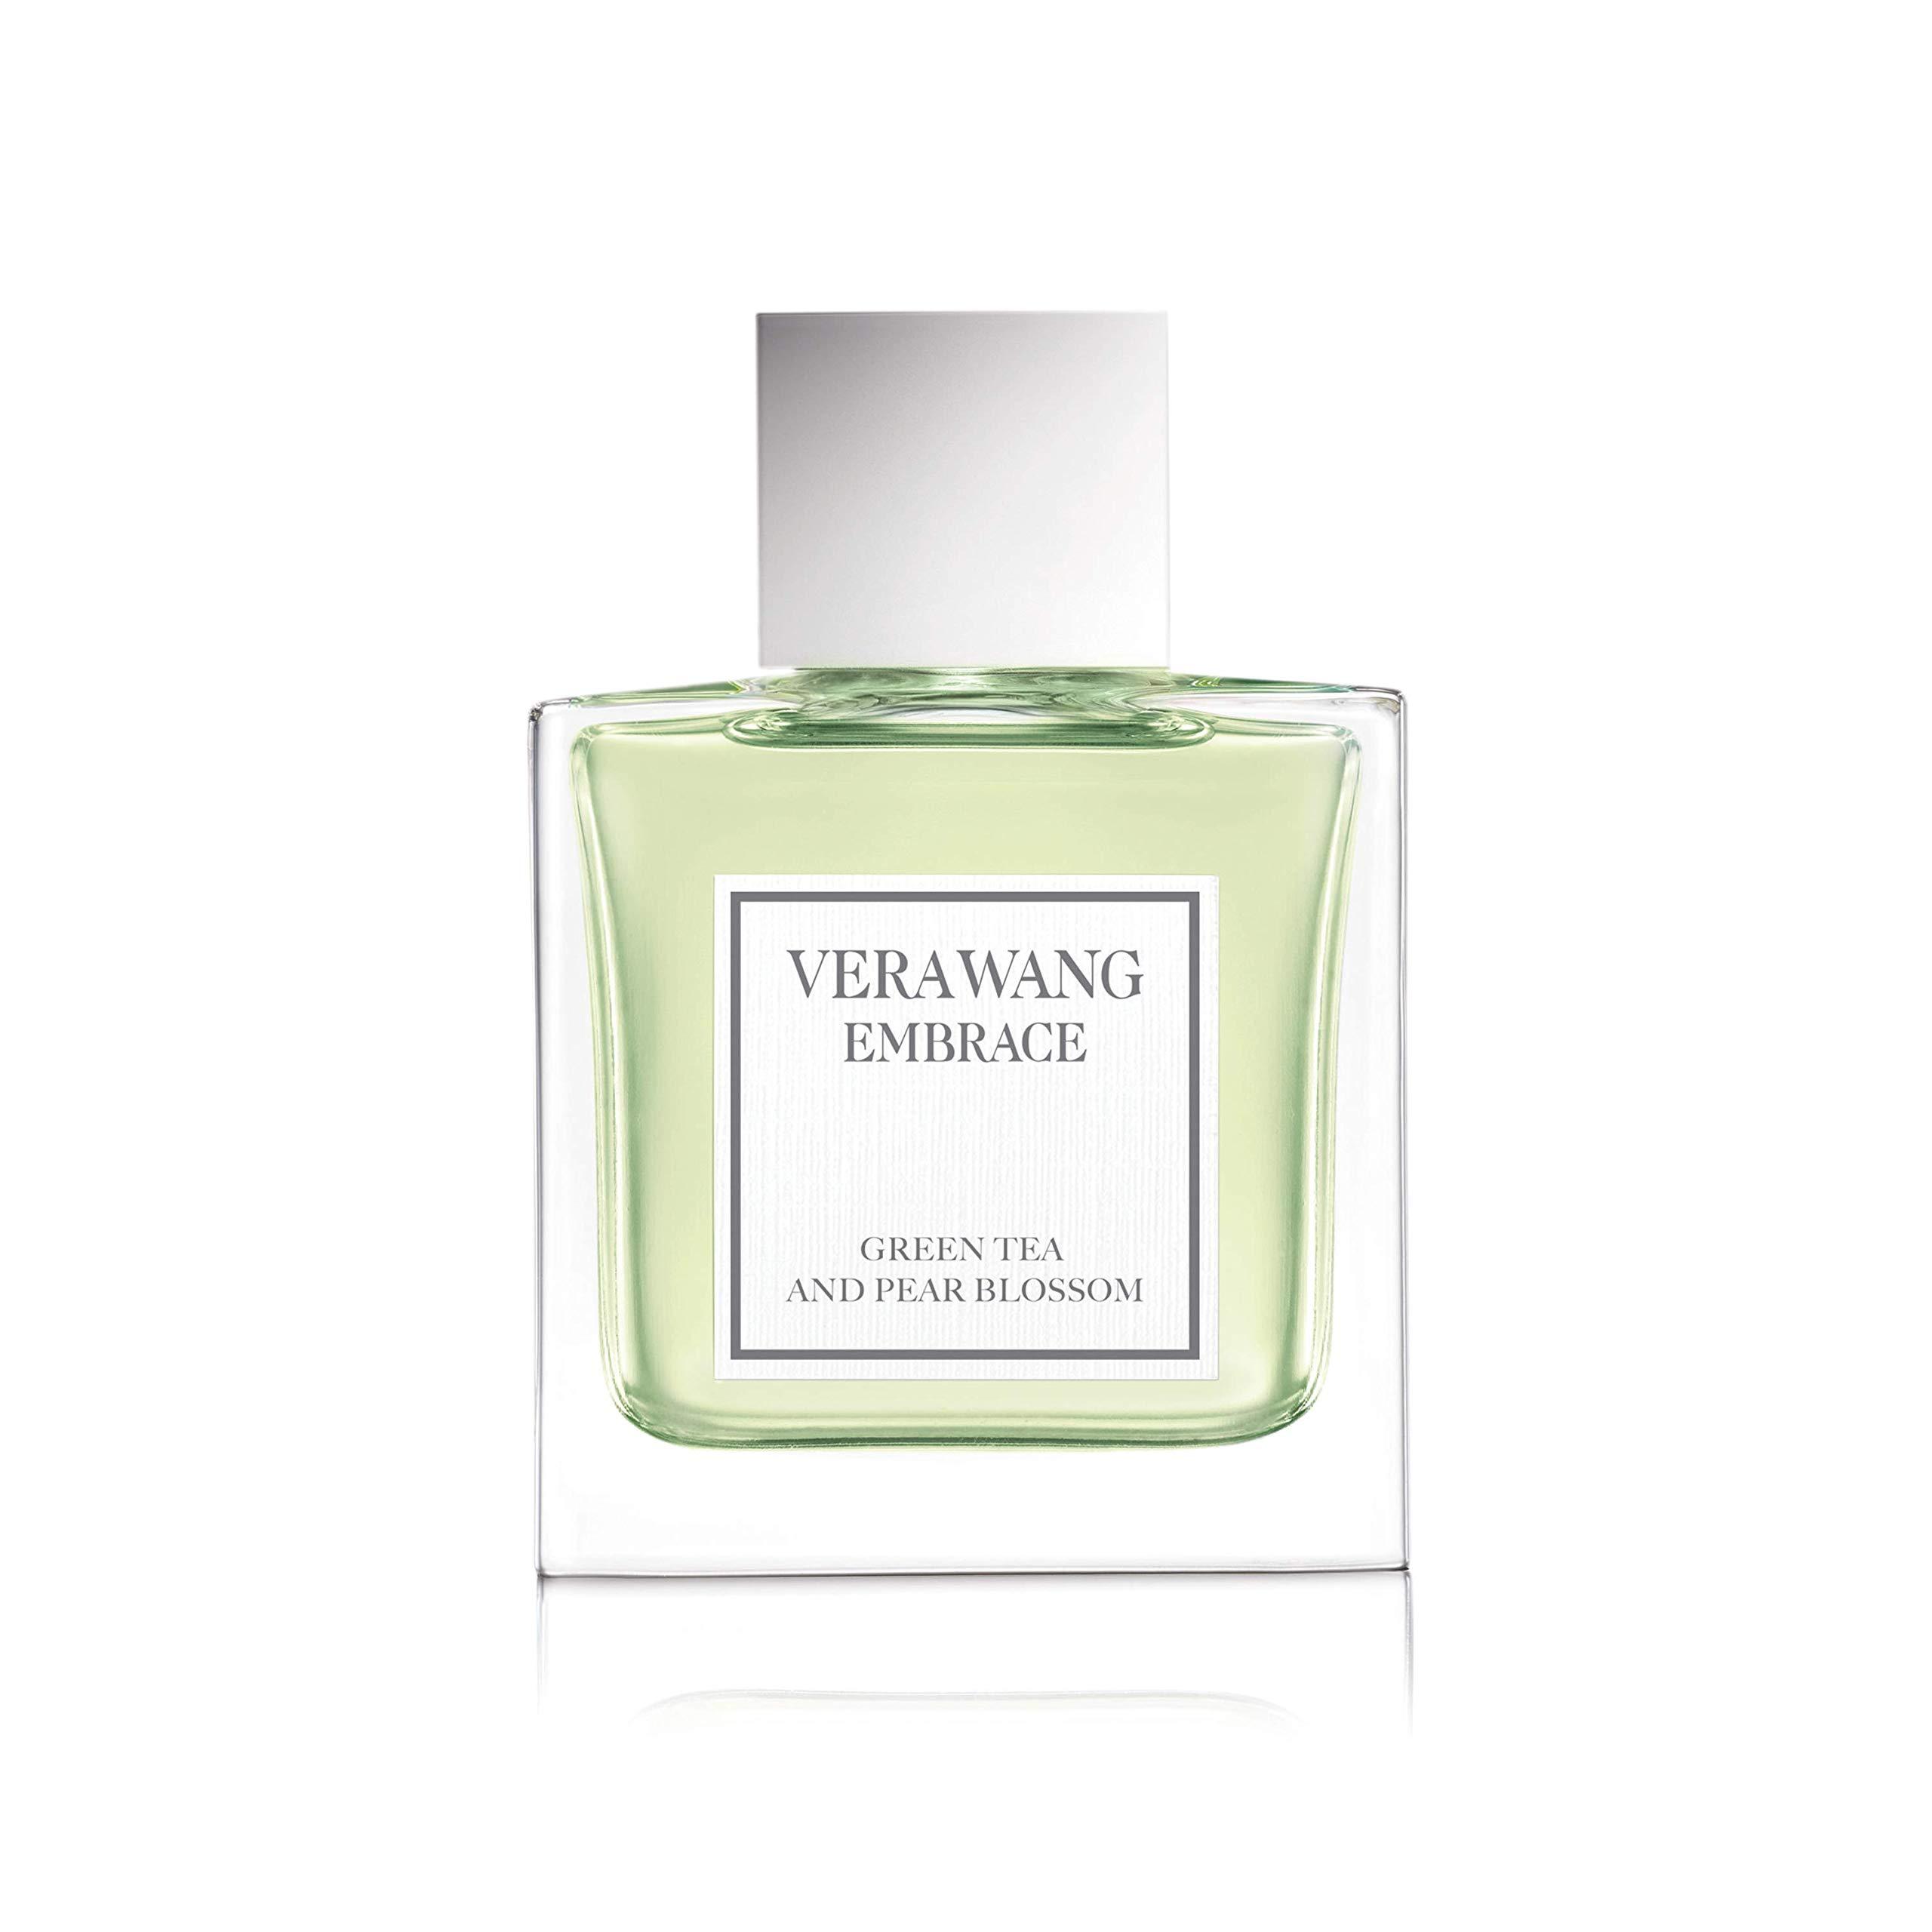 Vera Wang Embrace Eau de Toilette Spray for Women, Green Tea & Pear Blossom, Great Mother's Day Gift, 1 Fluid Ounce